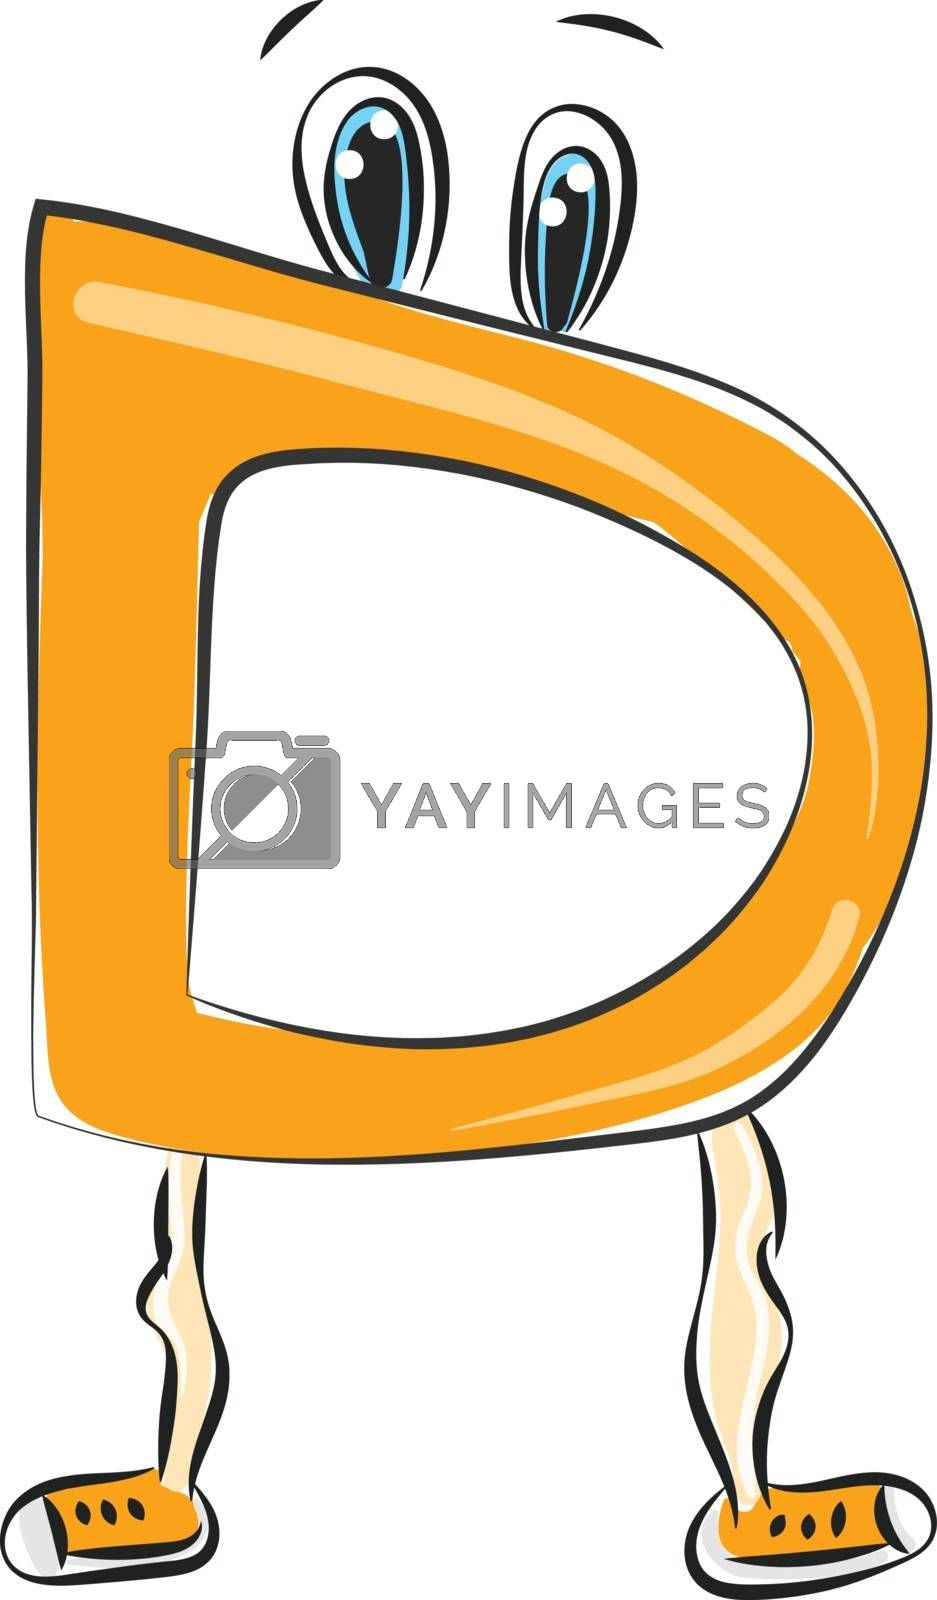 Royalty free image of Letter D alphabet emoji vector or color illustration by Morphart